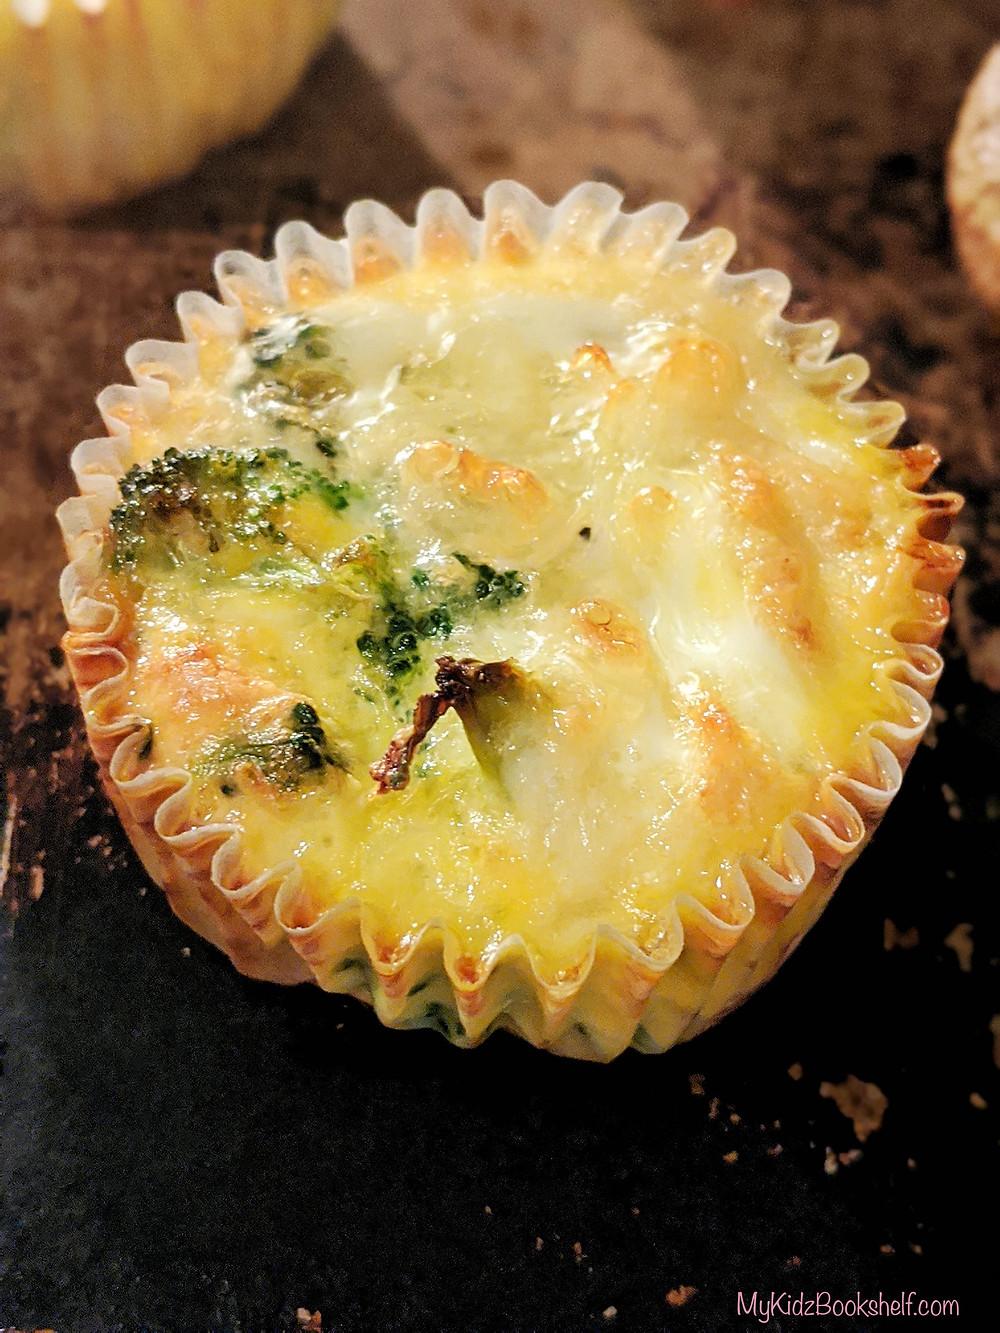 Broccoli cheddar mini crustless quiche made in a muffin tin